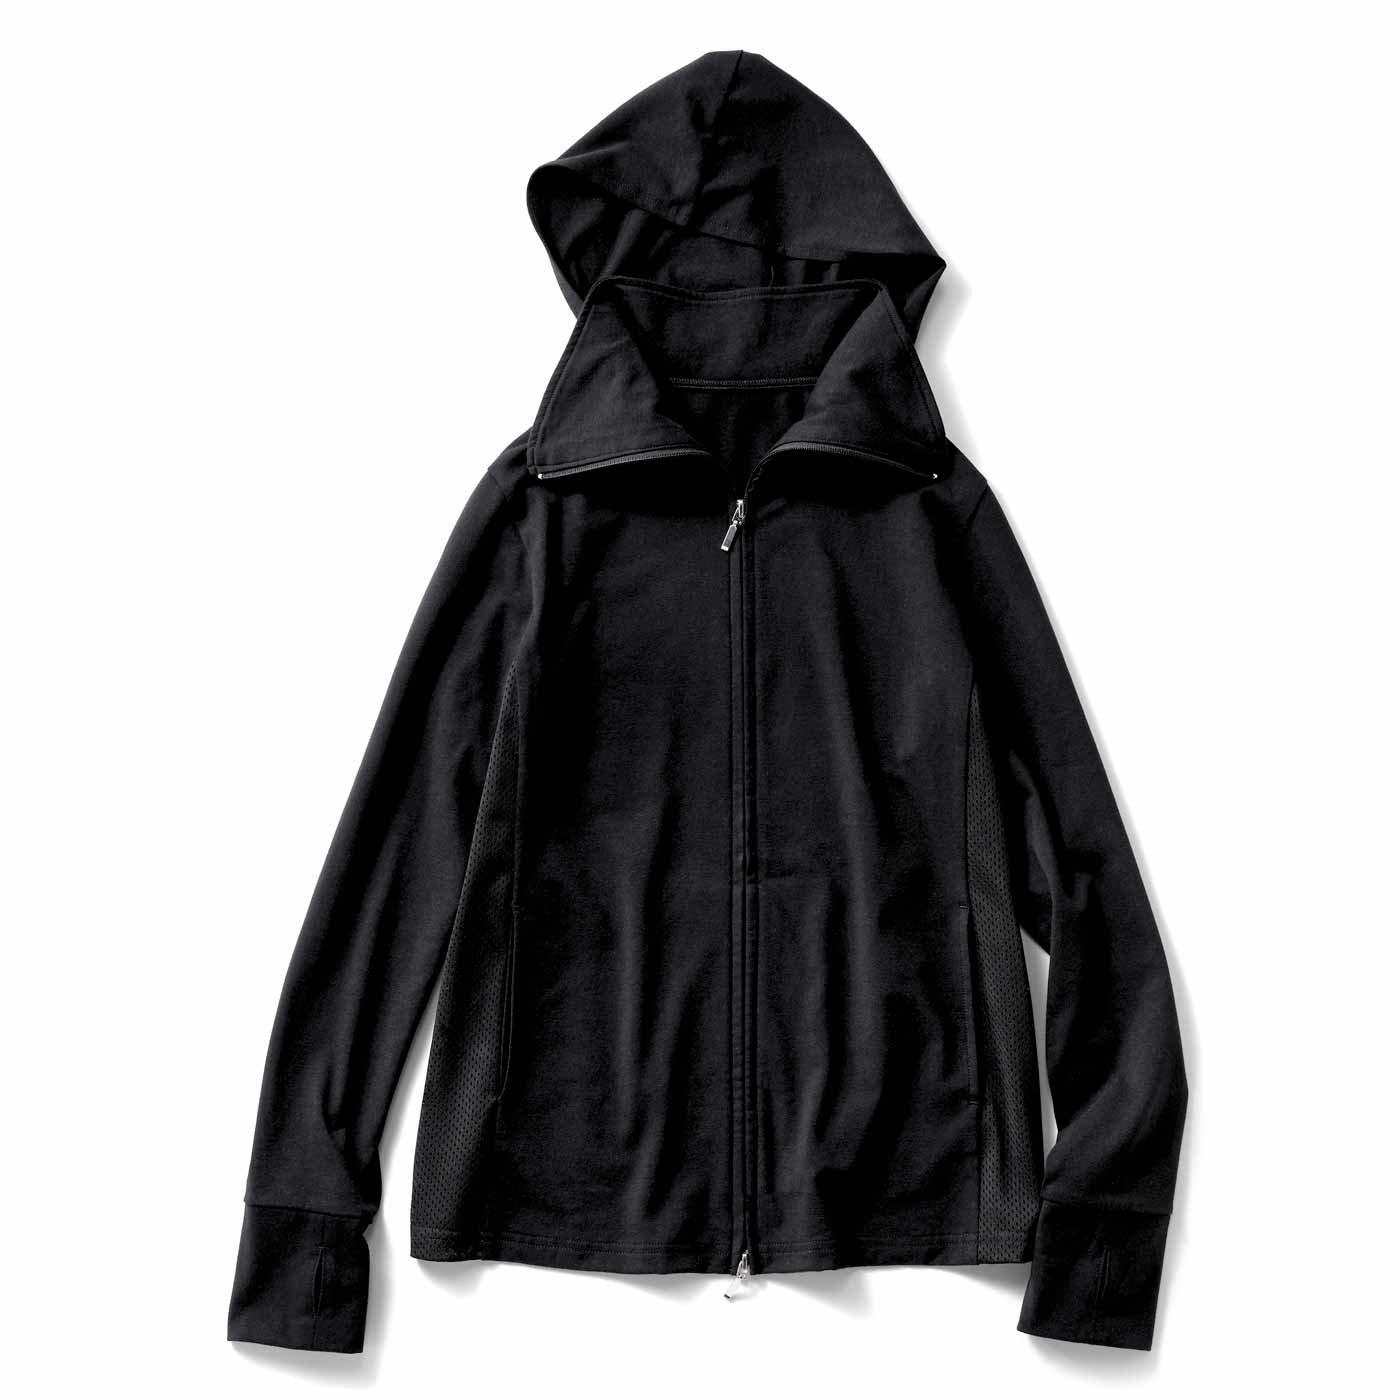 IEDIT[イディット] サッとはおって日差し対策 衿高仕様の吸汗速乾UVパーカー〈ブラック〉